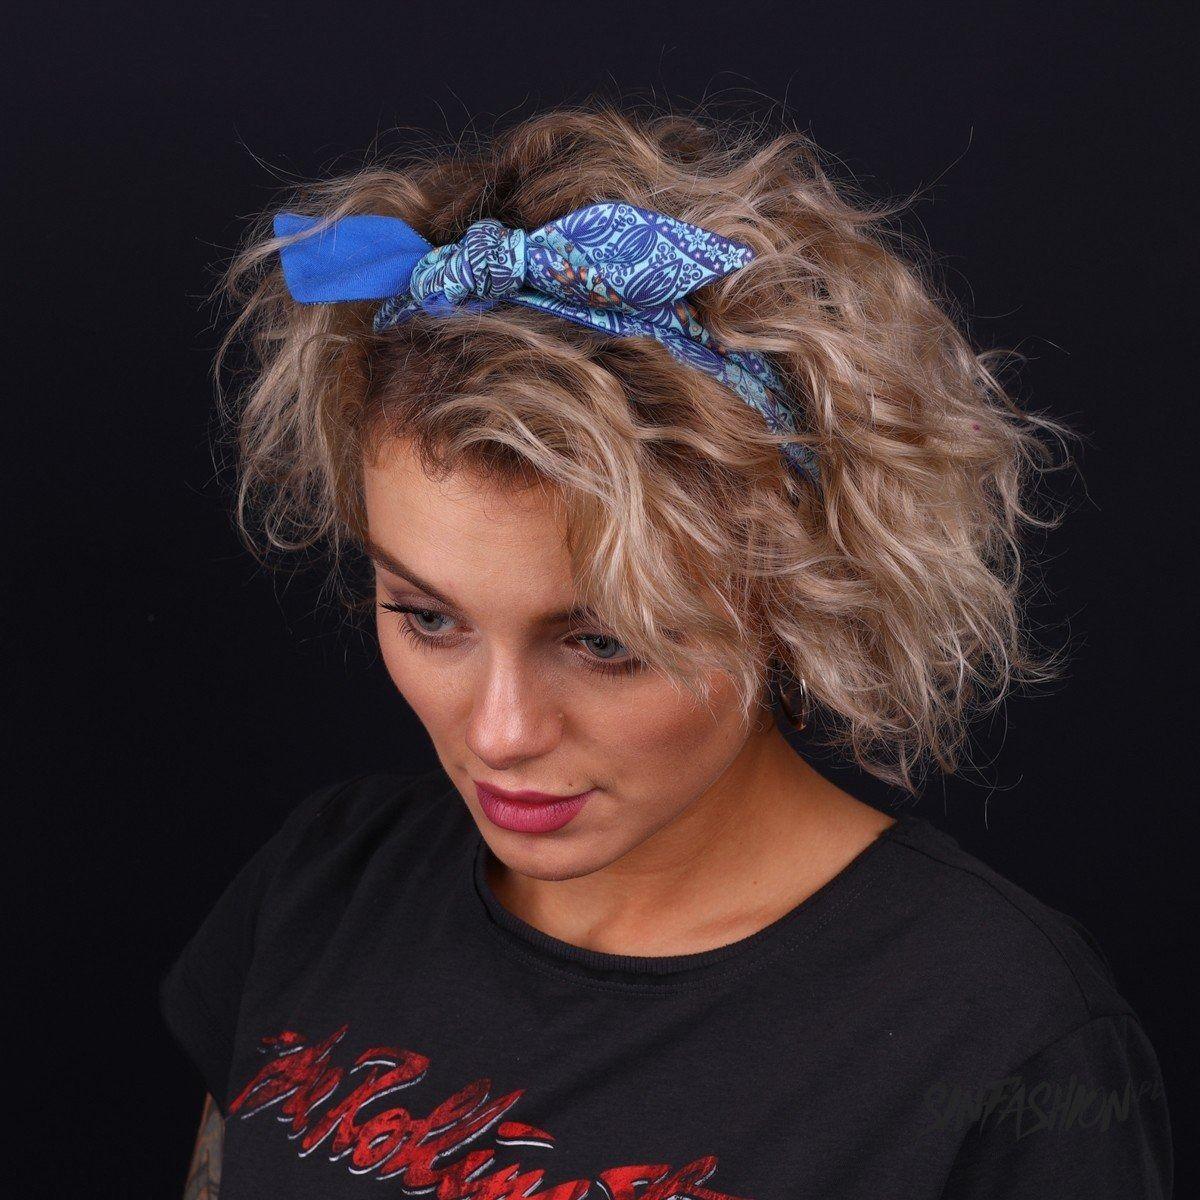 Bandana misshyde blue